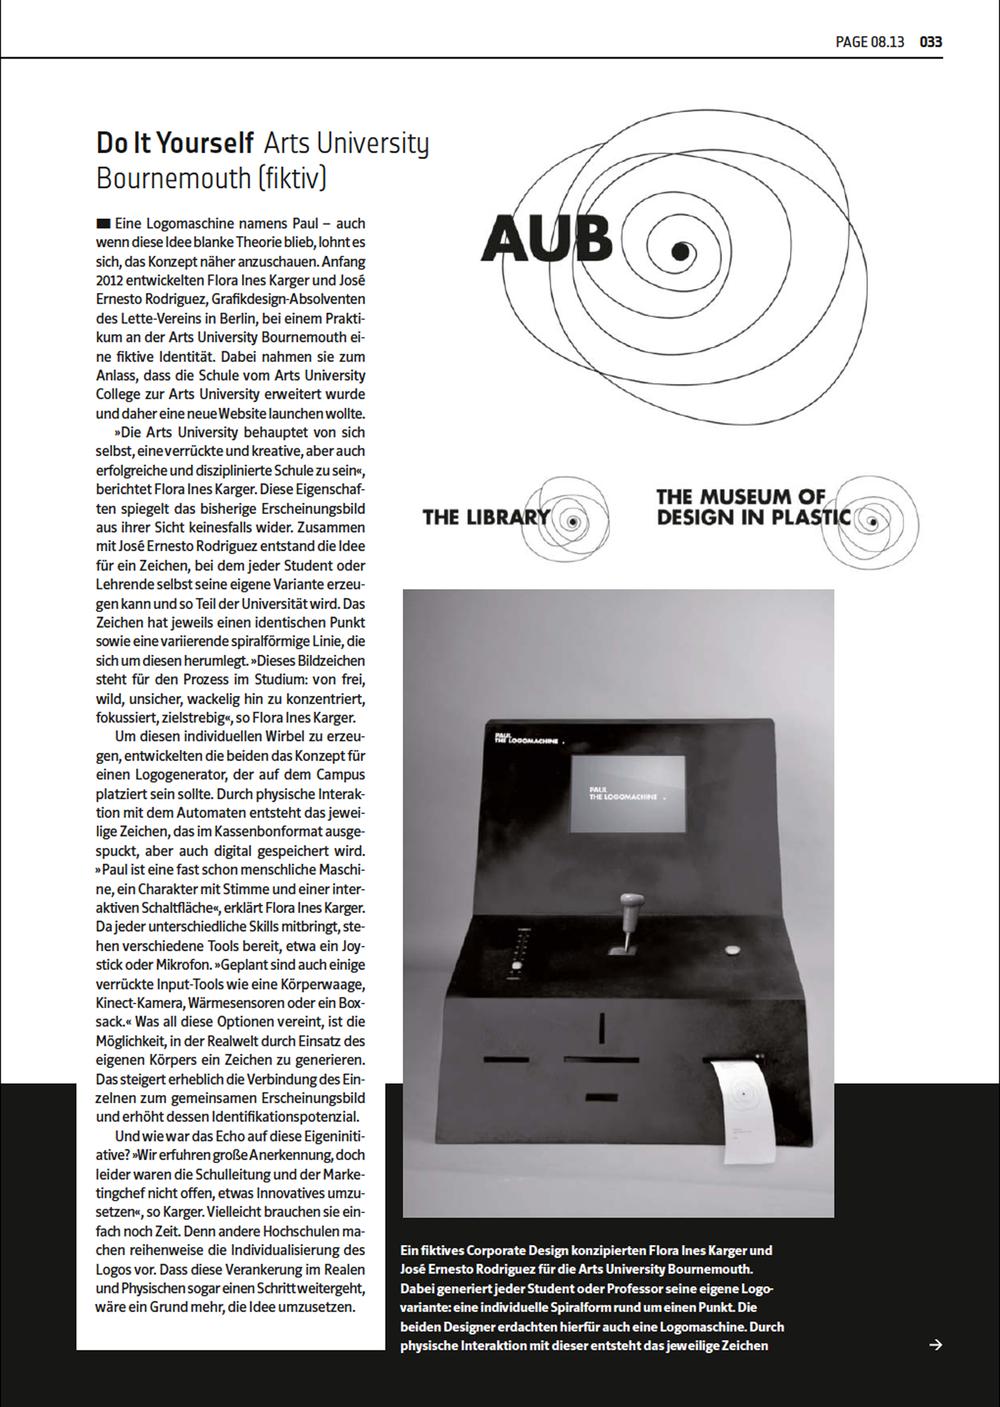 PAGE 08.13 TITEL: Corporate Design